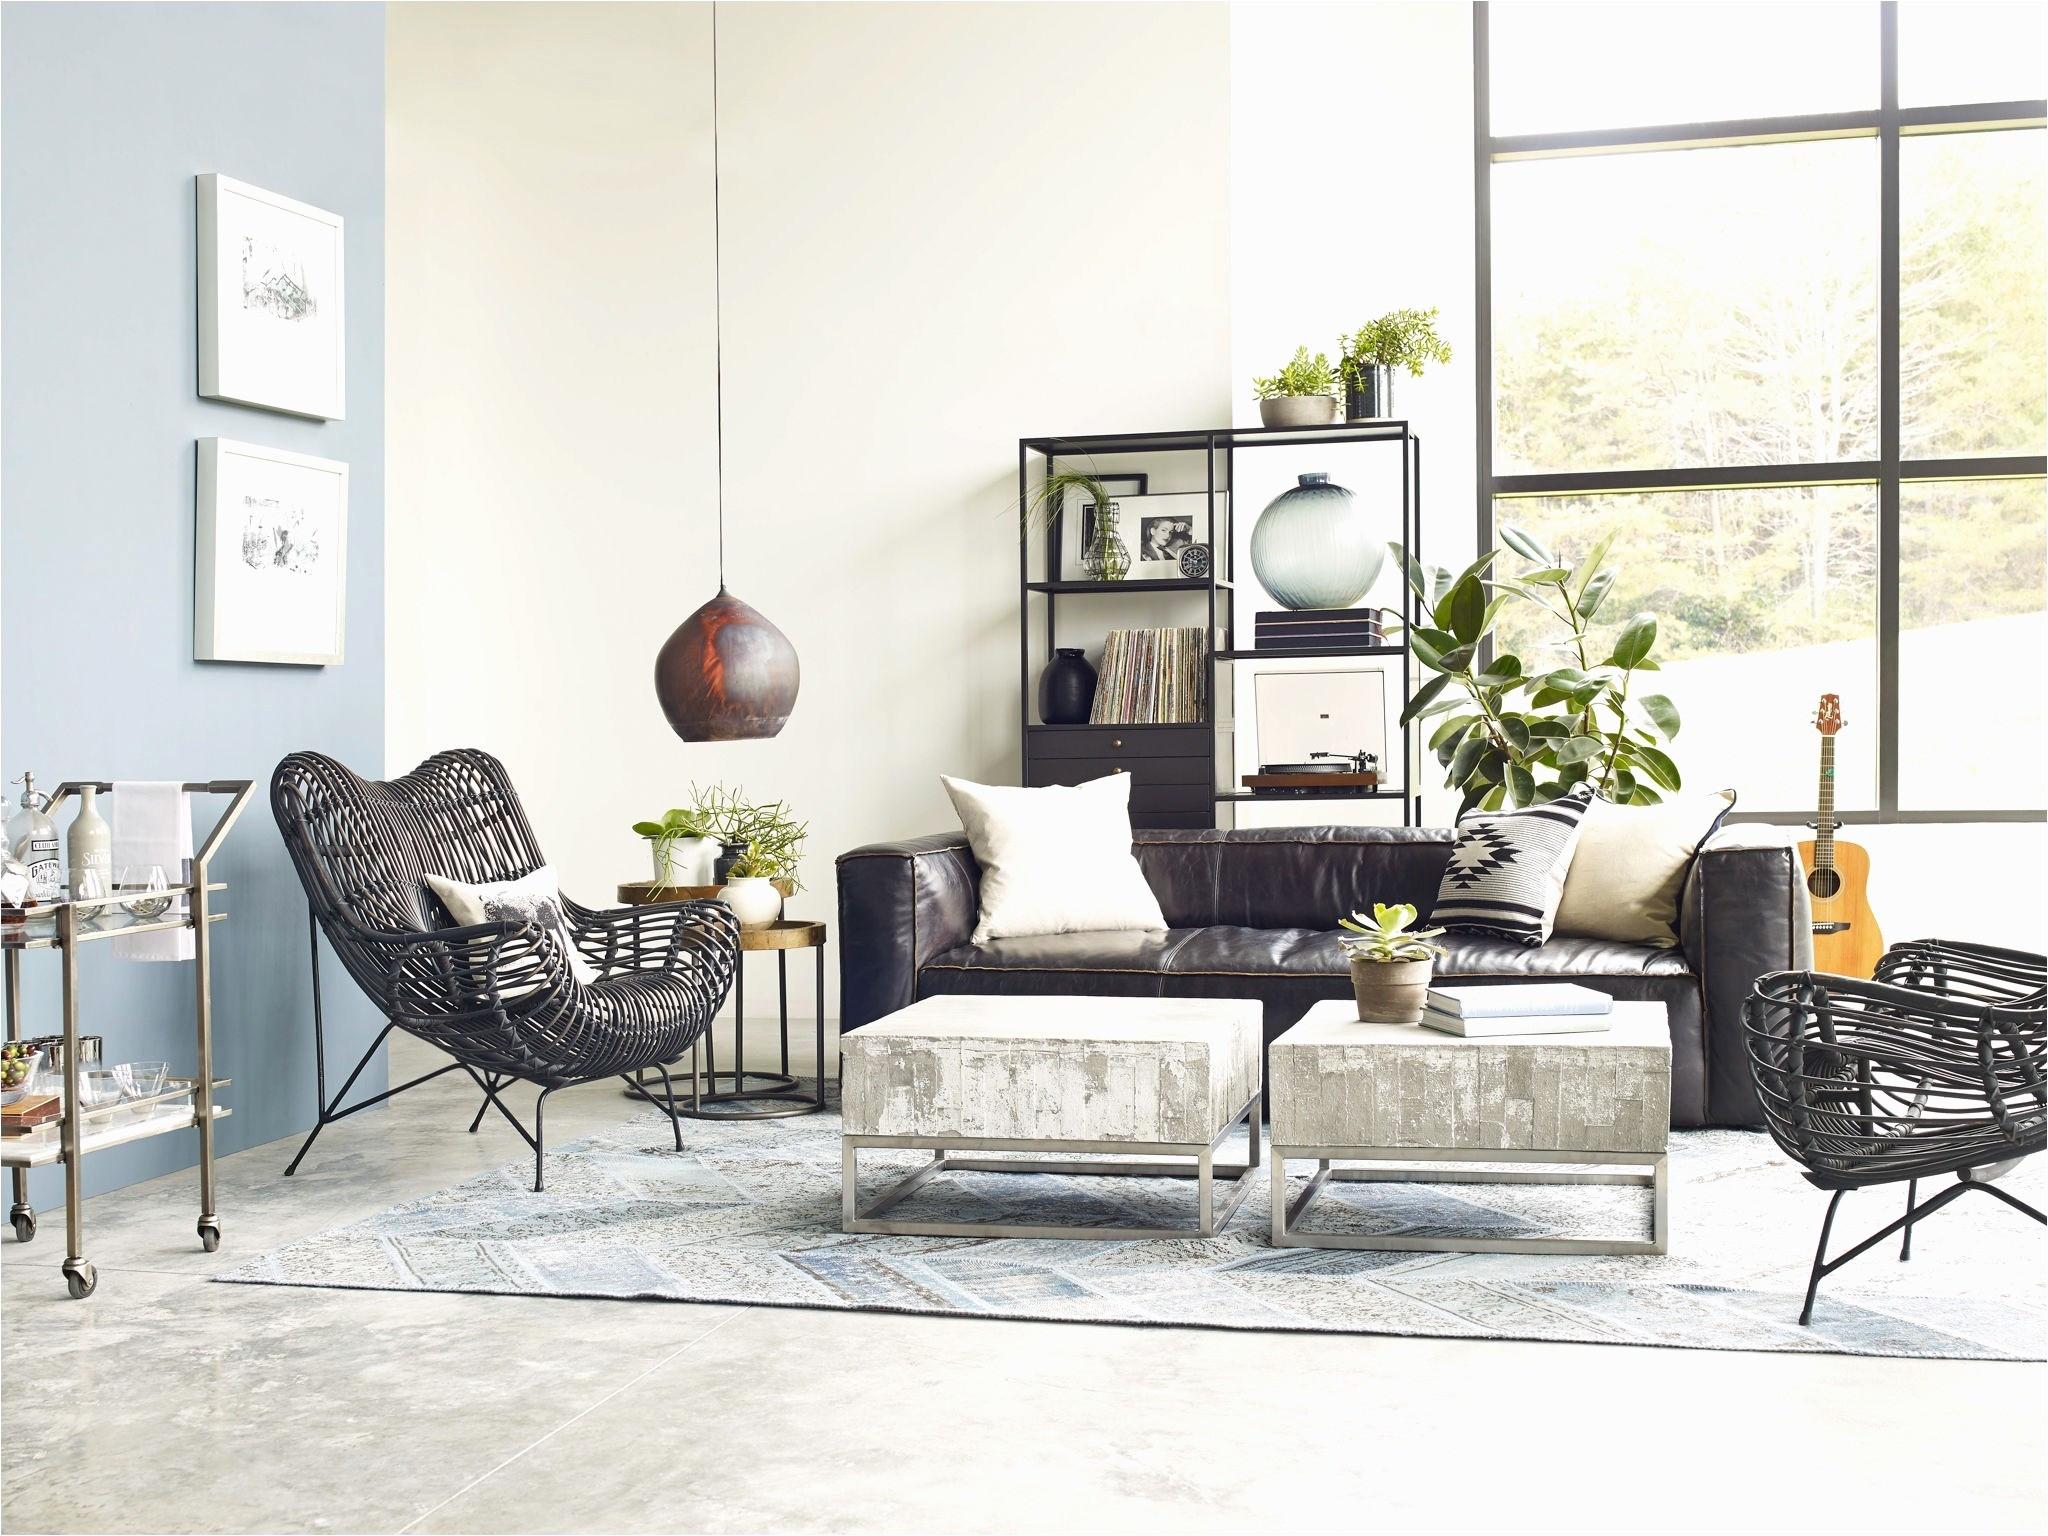 Decorative Accent Chairs Cheap Accent Chairs Ideas Unique Chair 48 Contemporary Decorative Chair